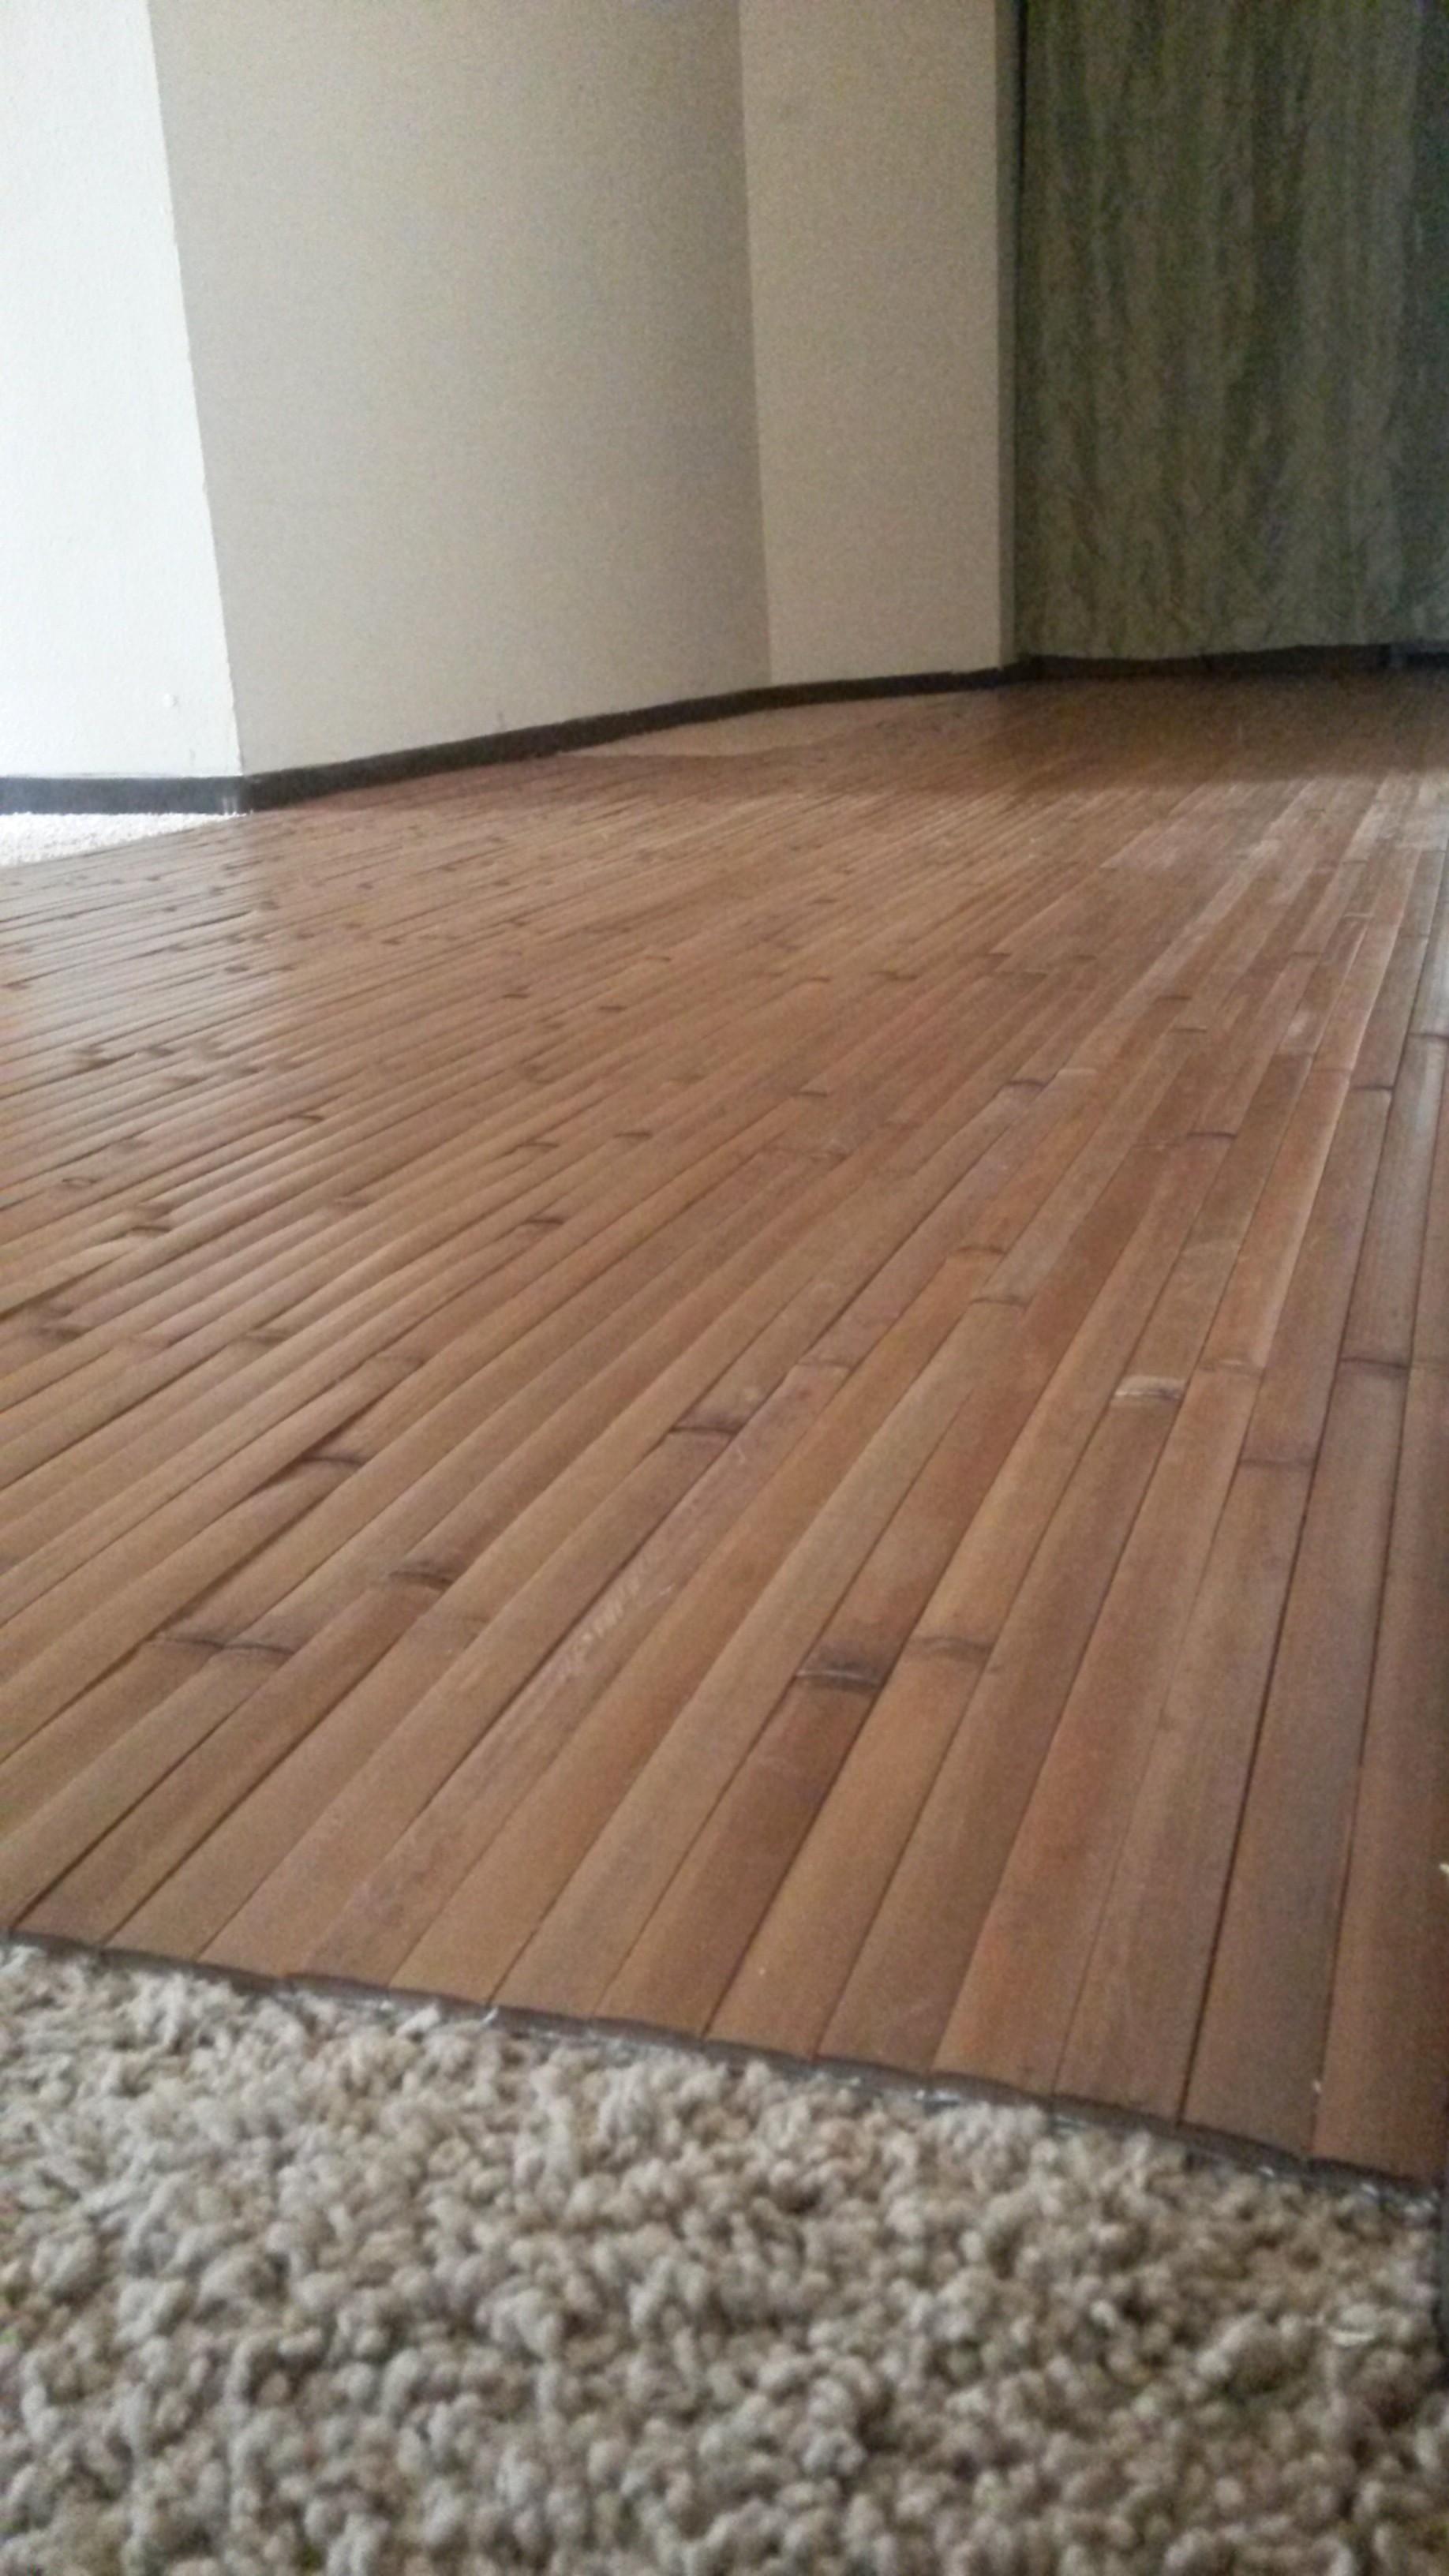 Best Flooring Over Carpet Solution Ever!